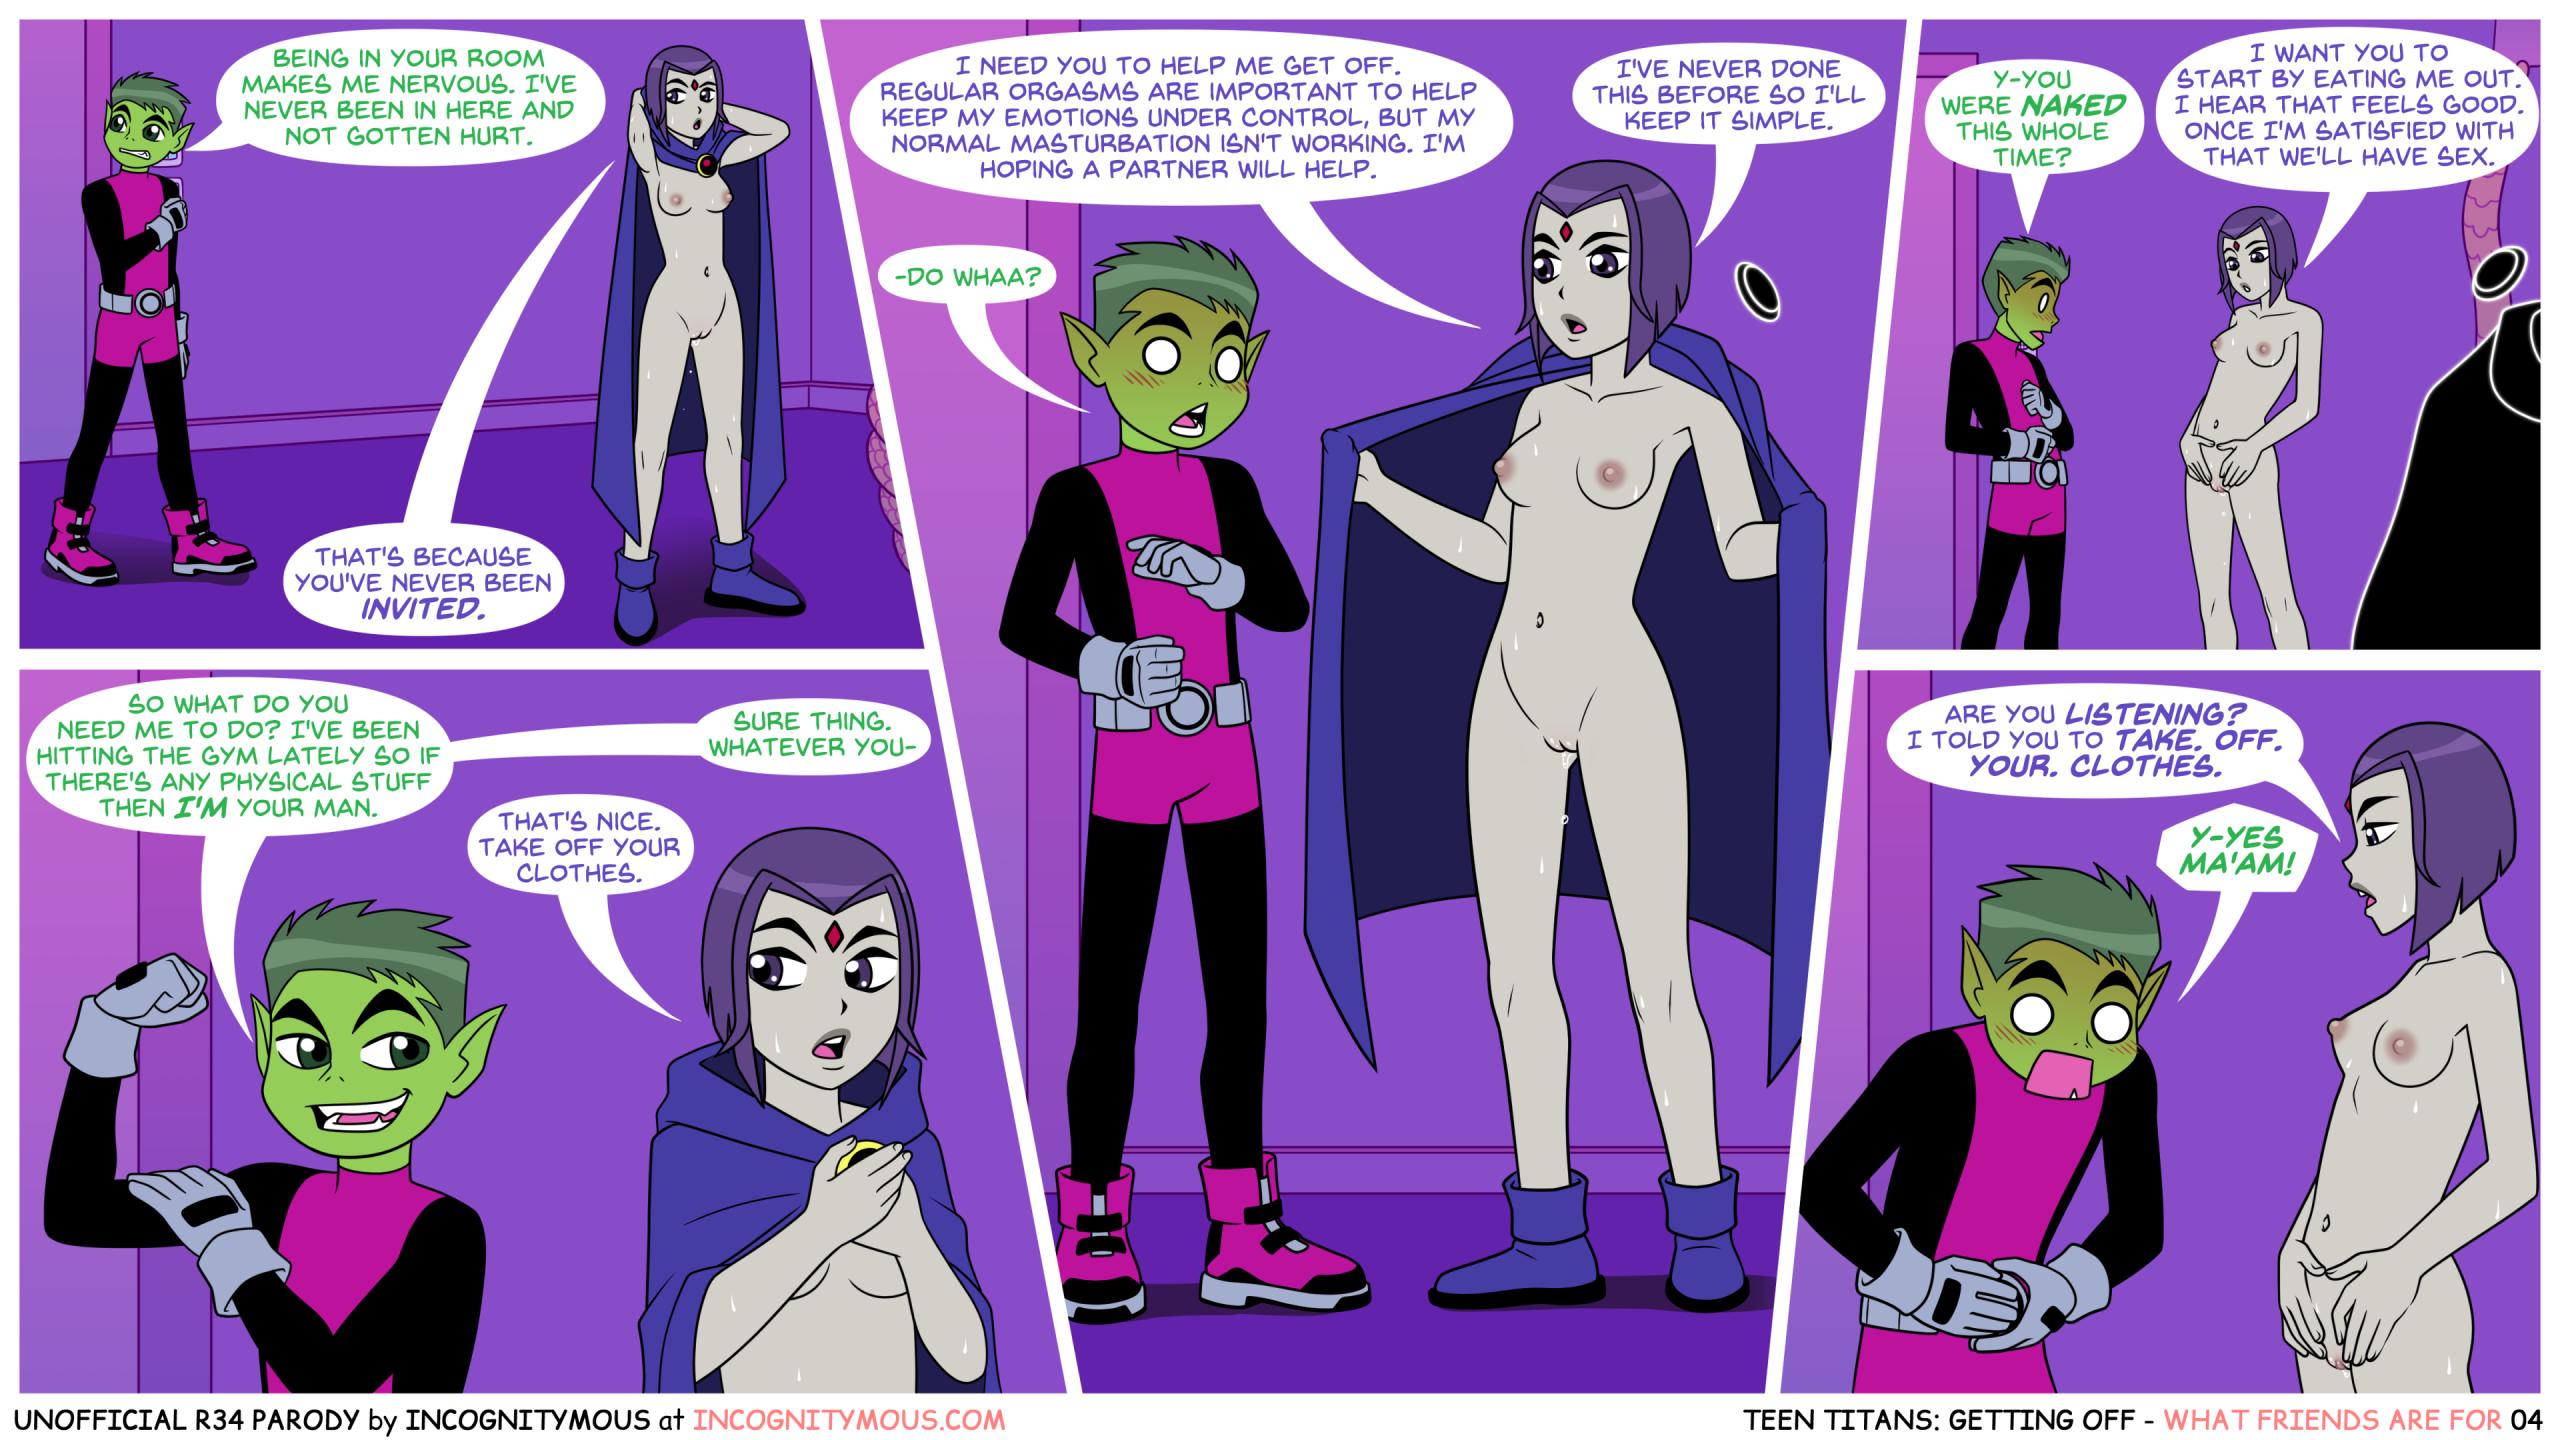 Teen Titans: Getting Off porn comics Oral sex, Best, Sex Toys